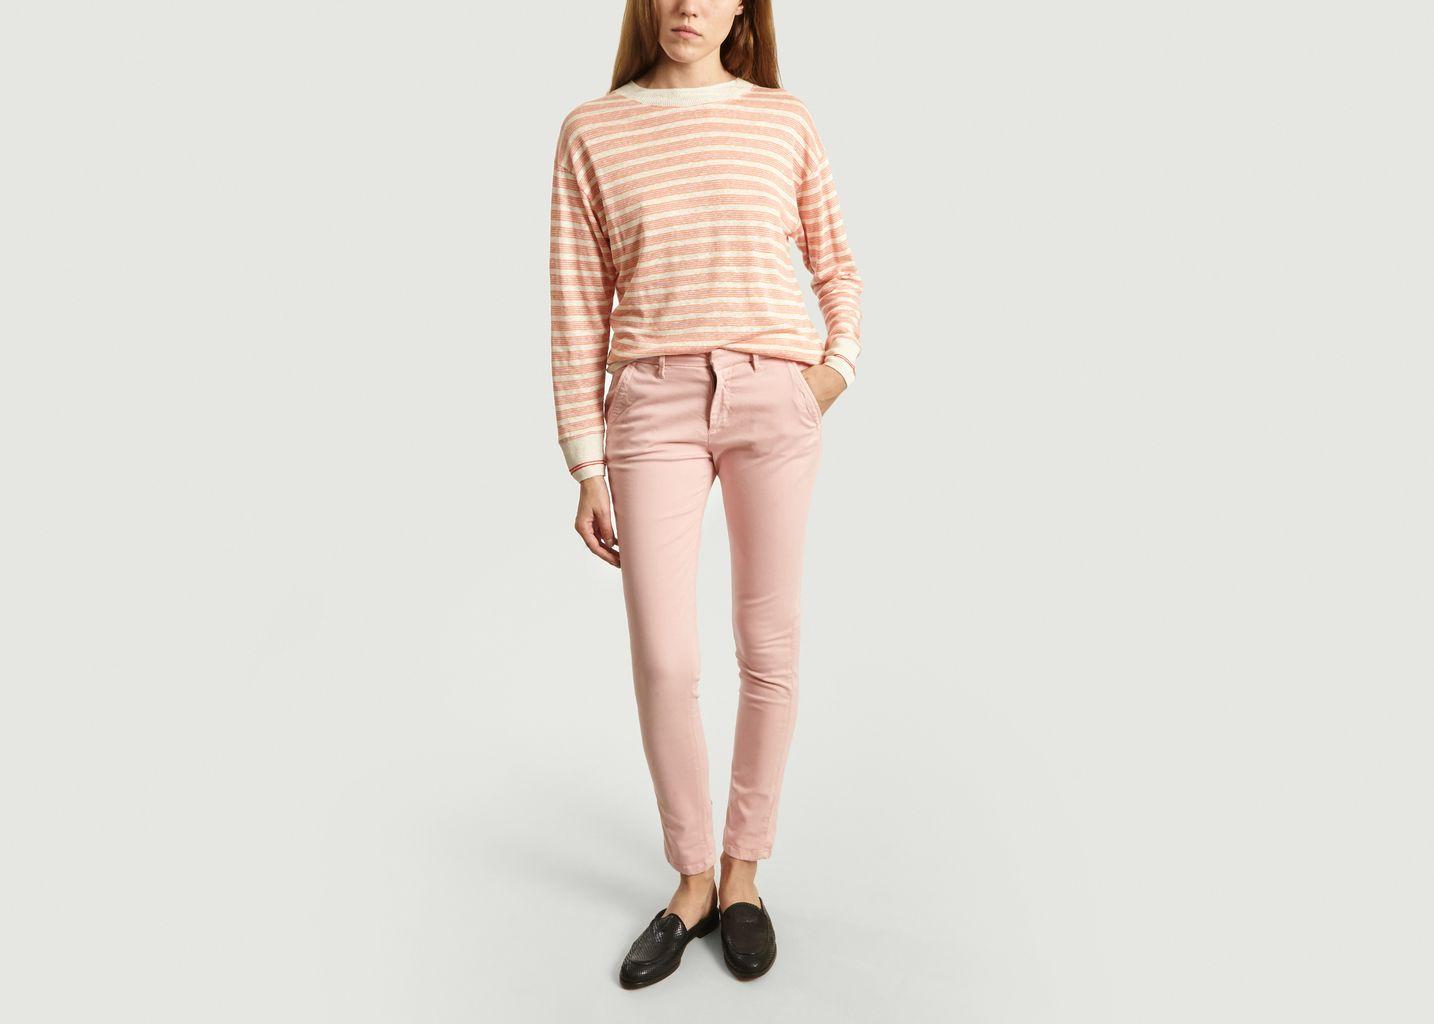 Pantalon Sandy 2 Basic - Reiko